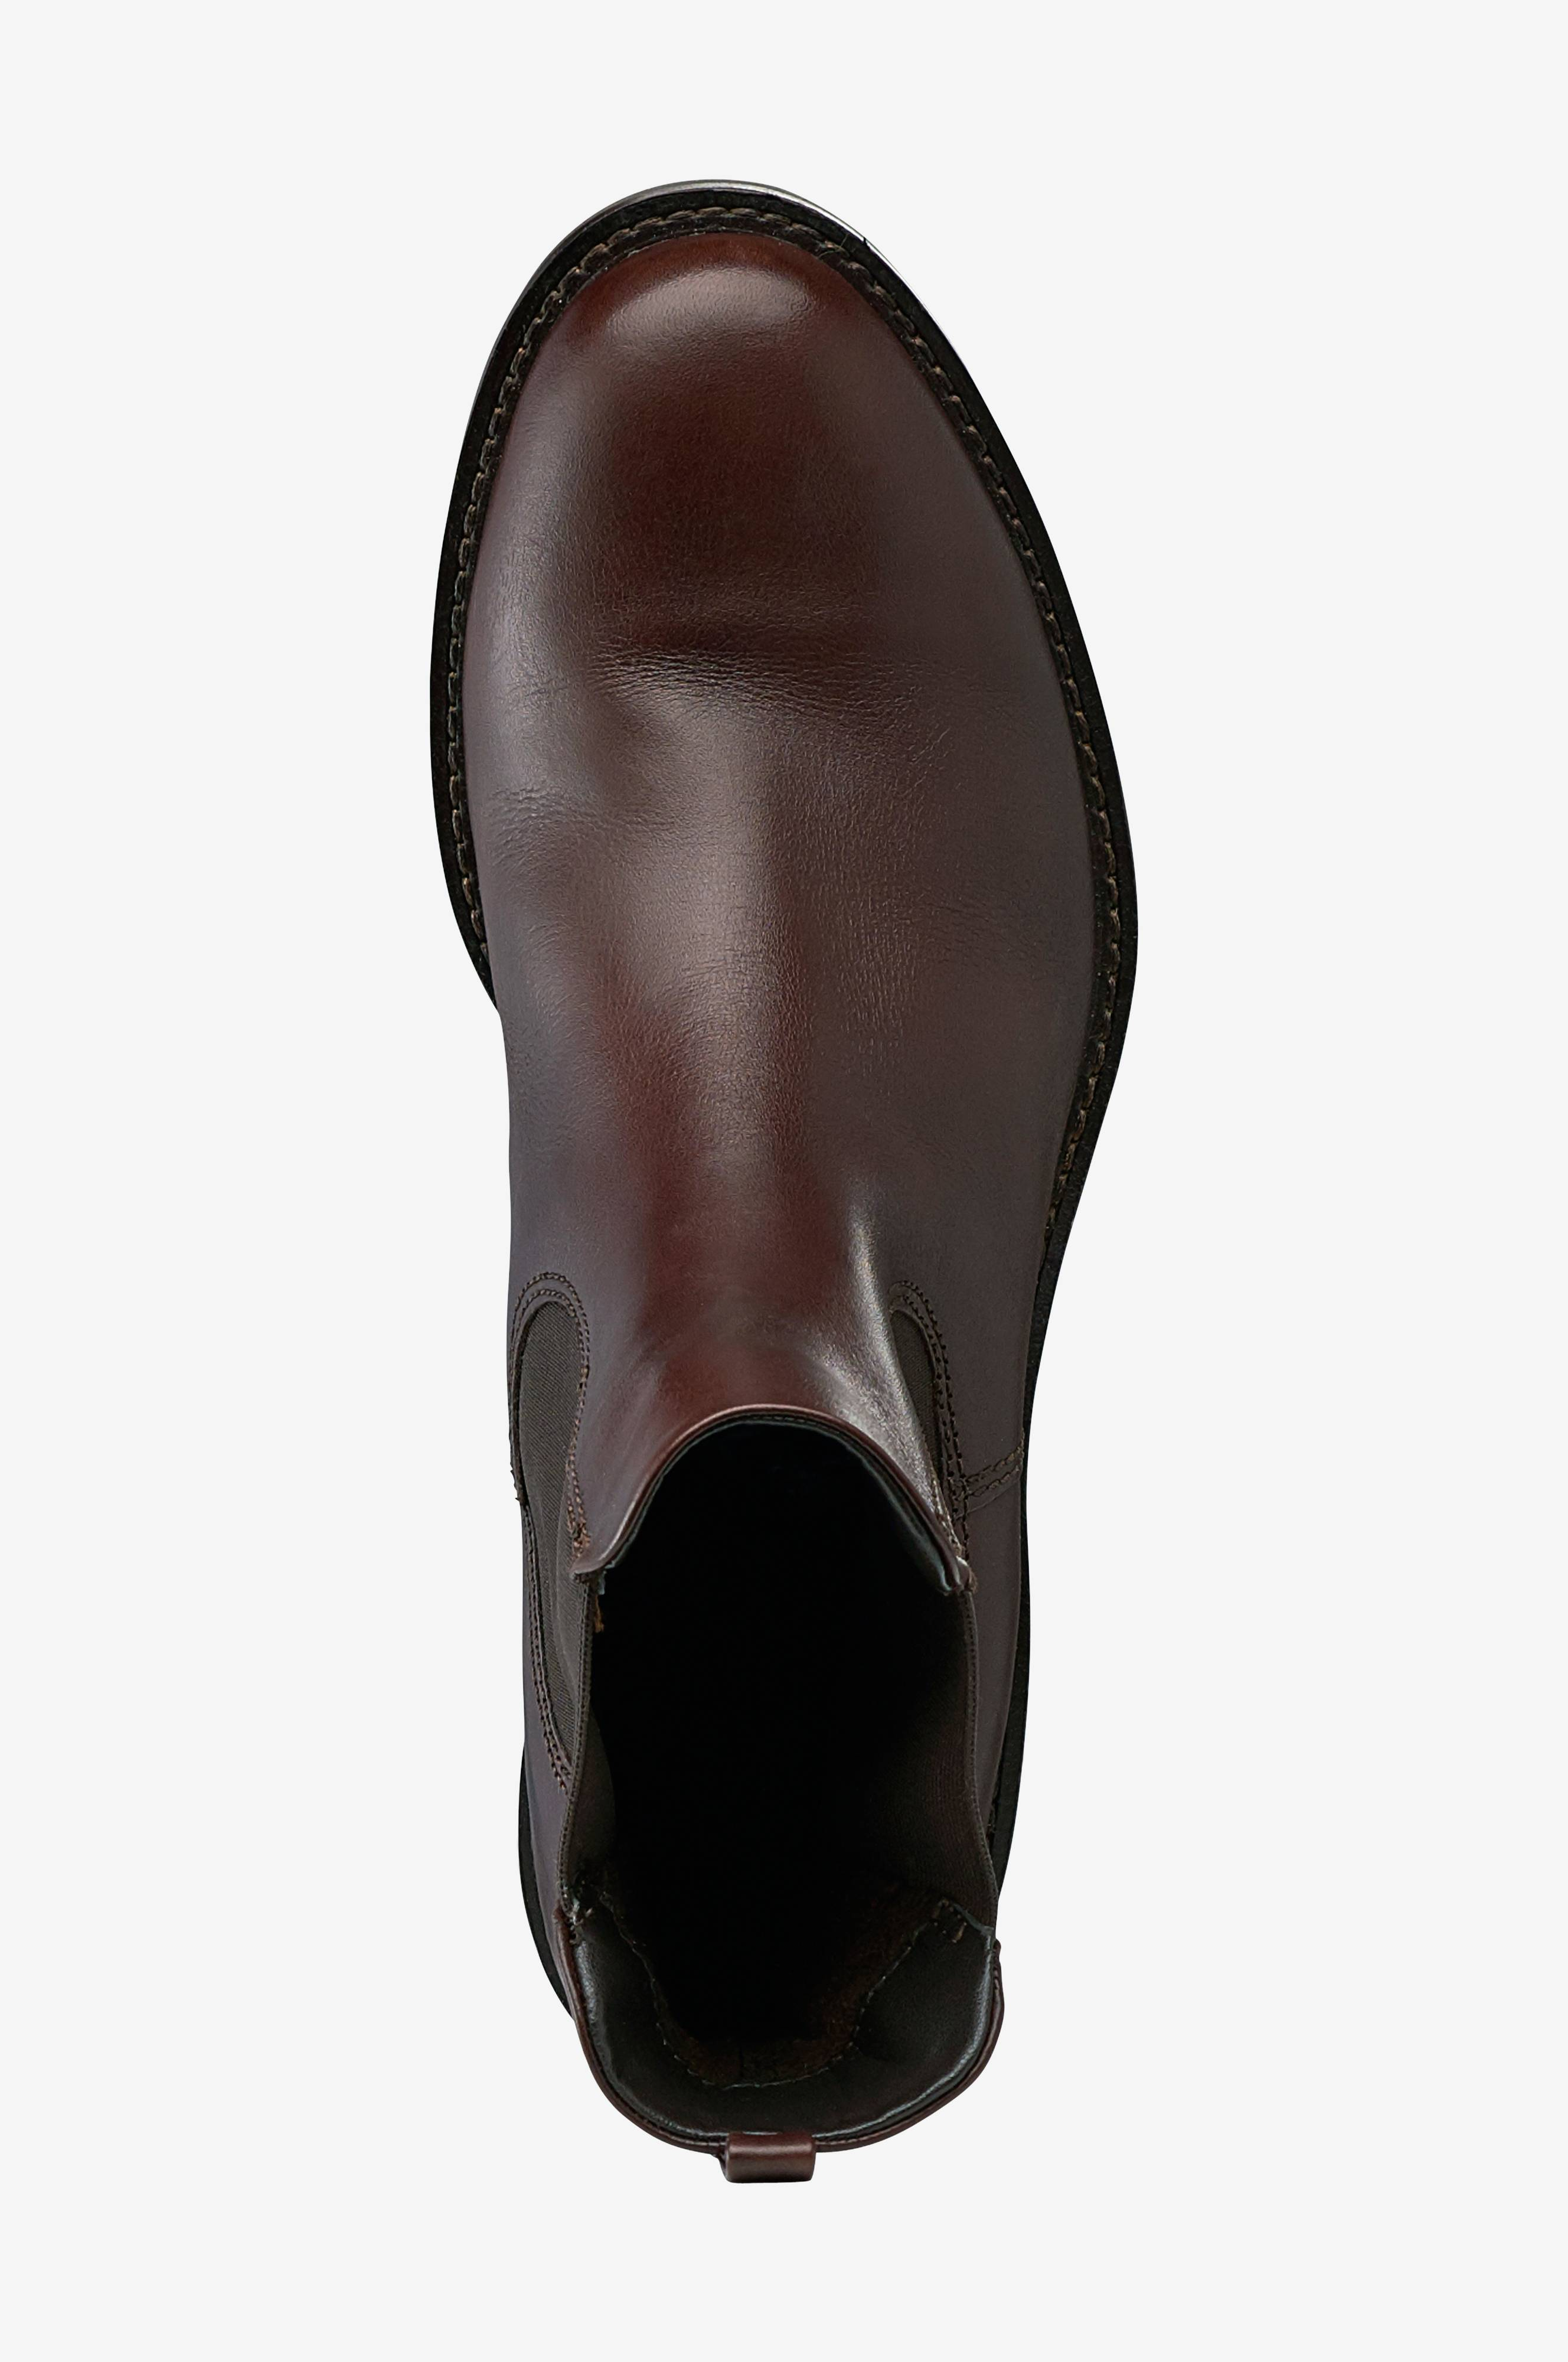 Nye Ecco Støvler På Tilbud,Shape 25 Riding Boot Dame Sort